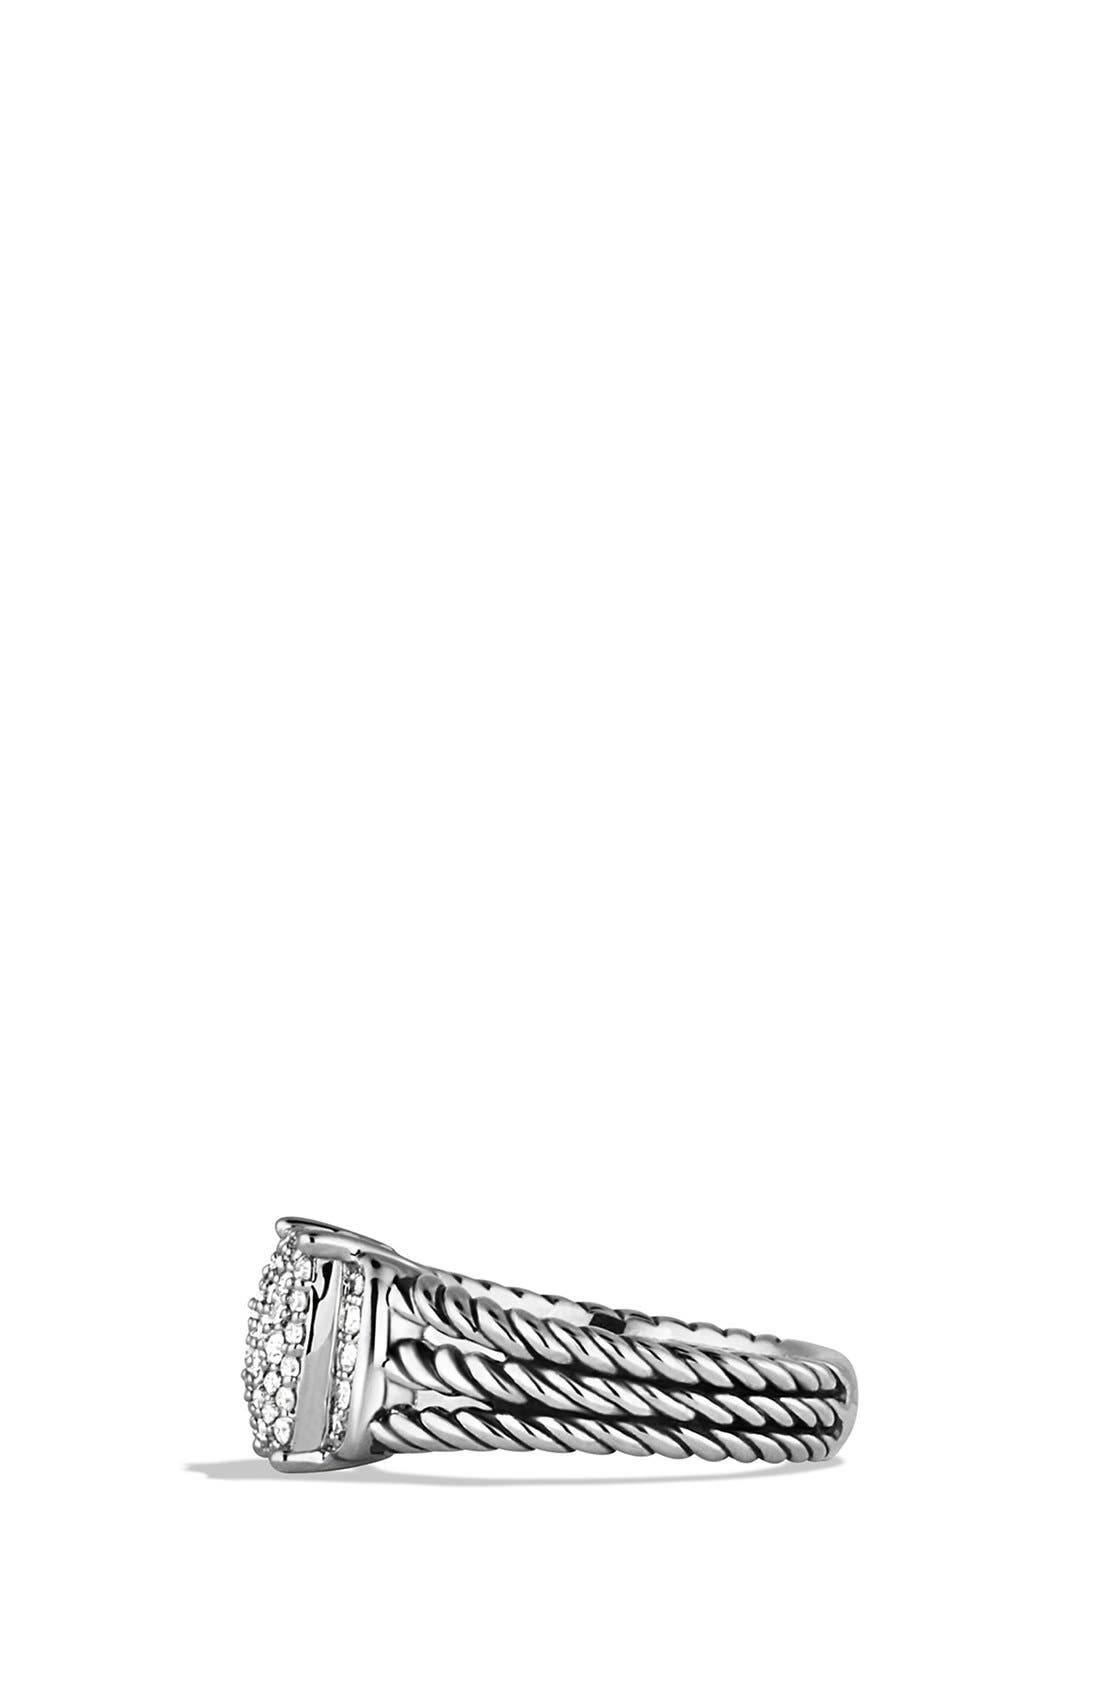 'Wheaton' Petite Ring with Diamonds,                             Alternate thumbnail 3, color,                             DIAMOND